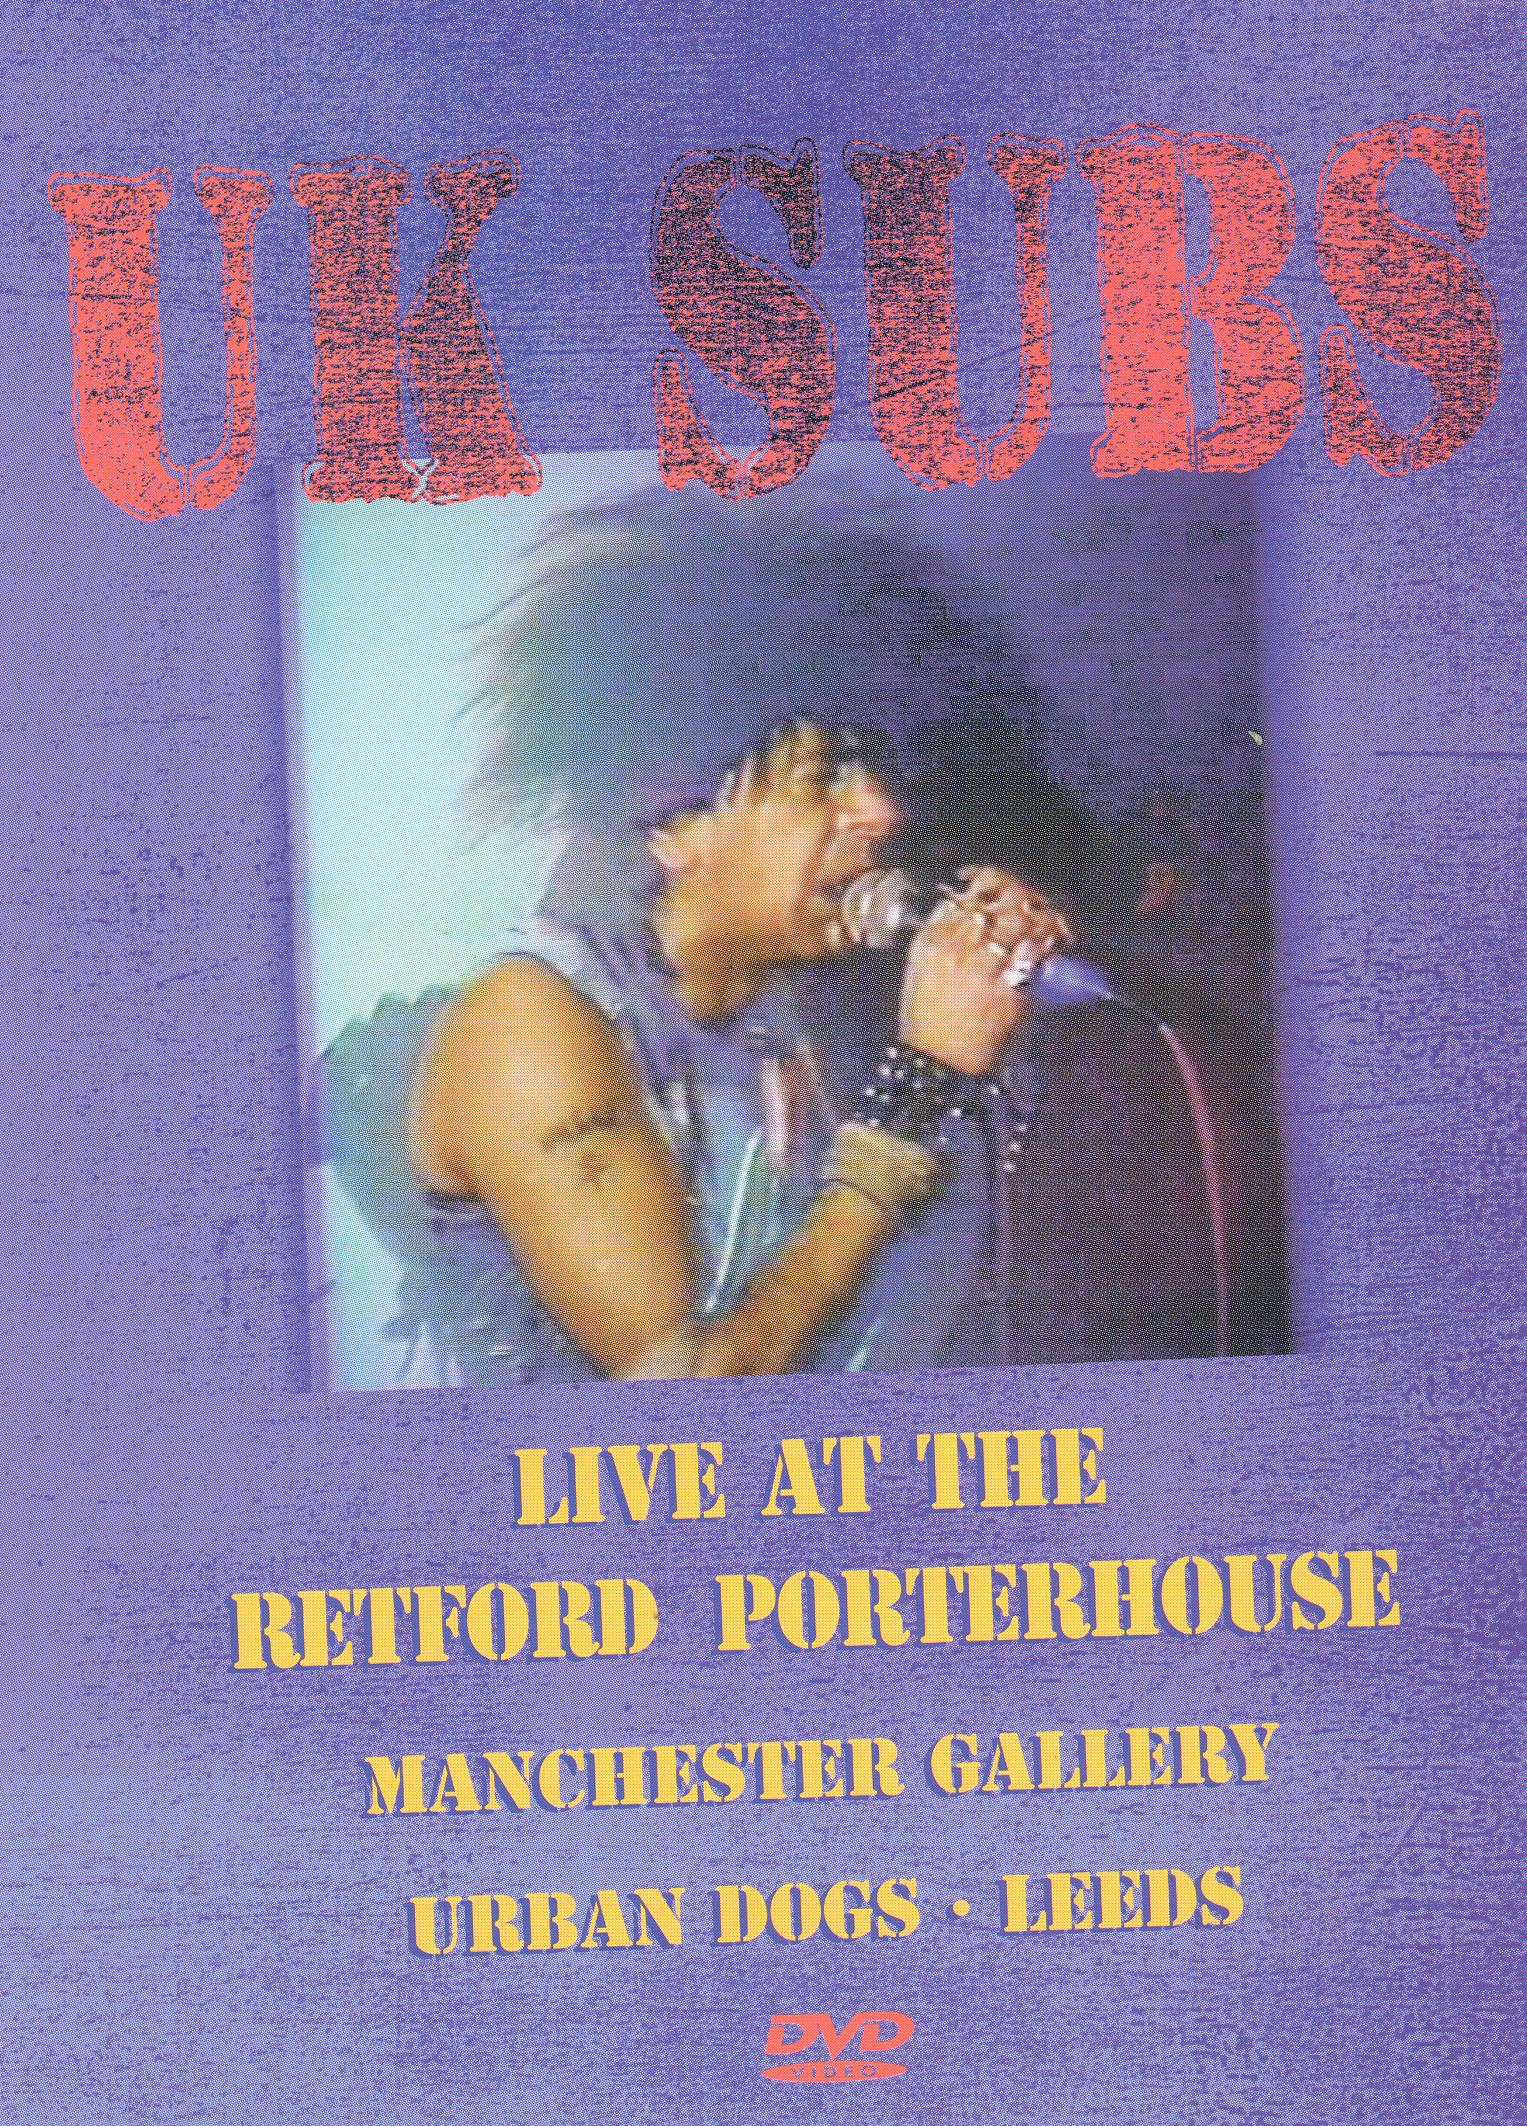 UK Subs: Live at the Retford Porterhouse